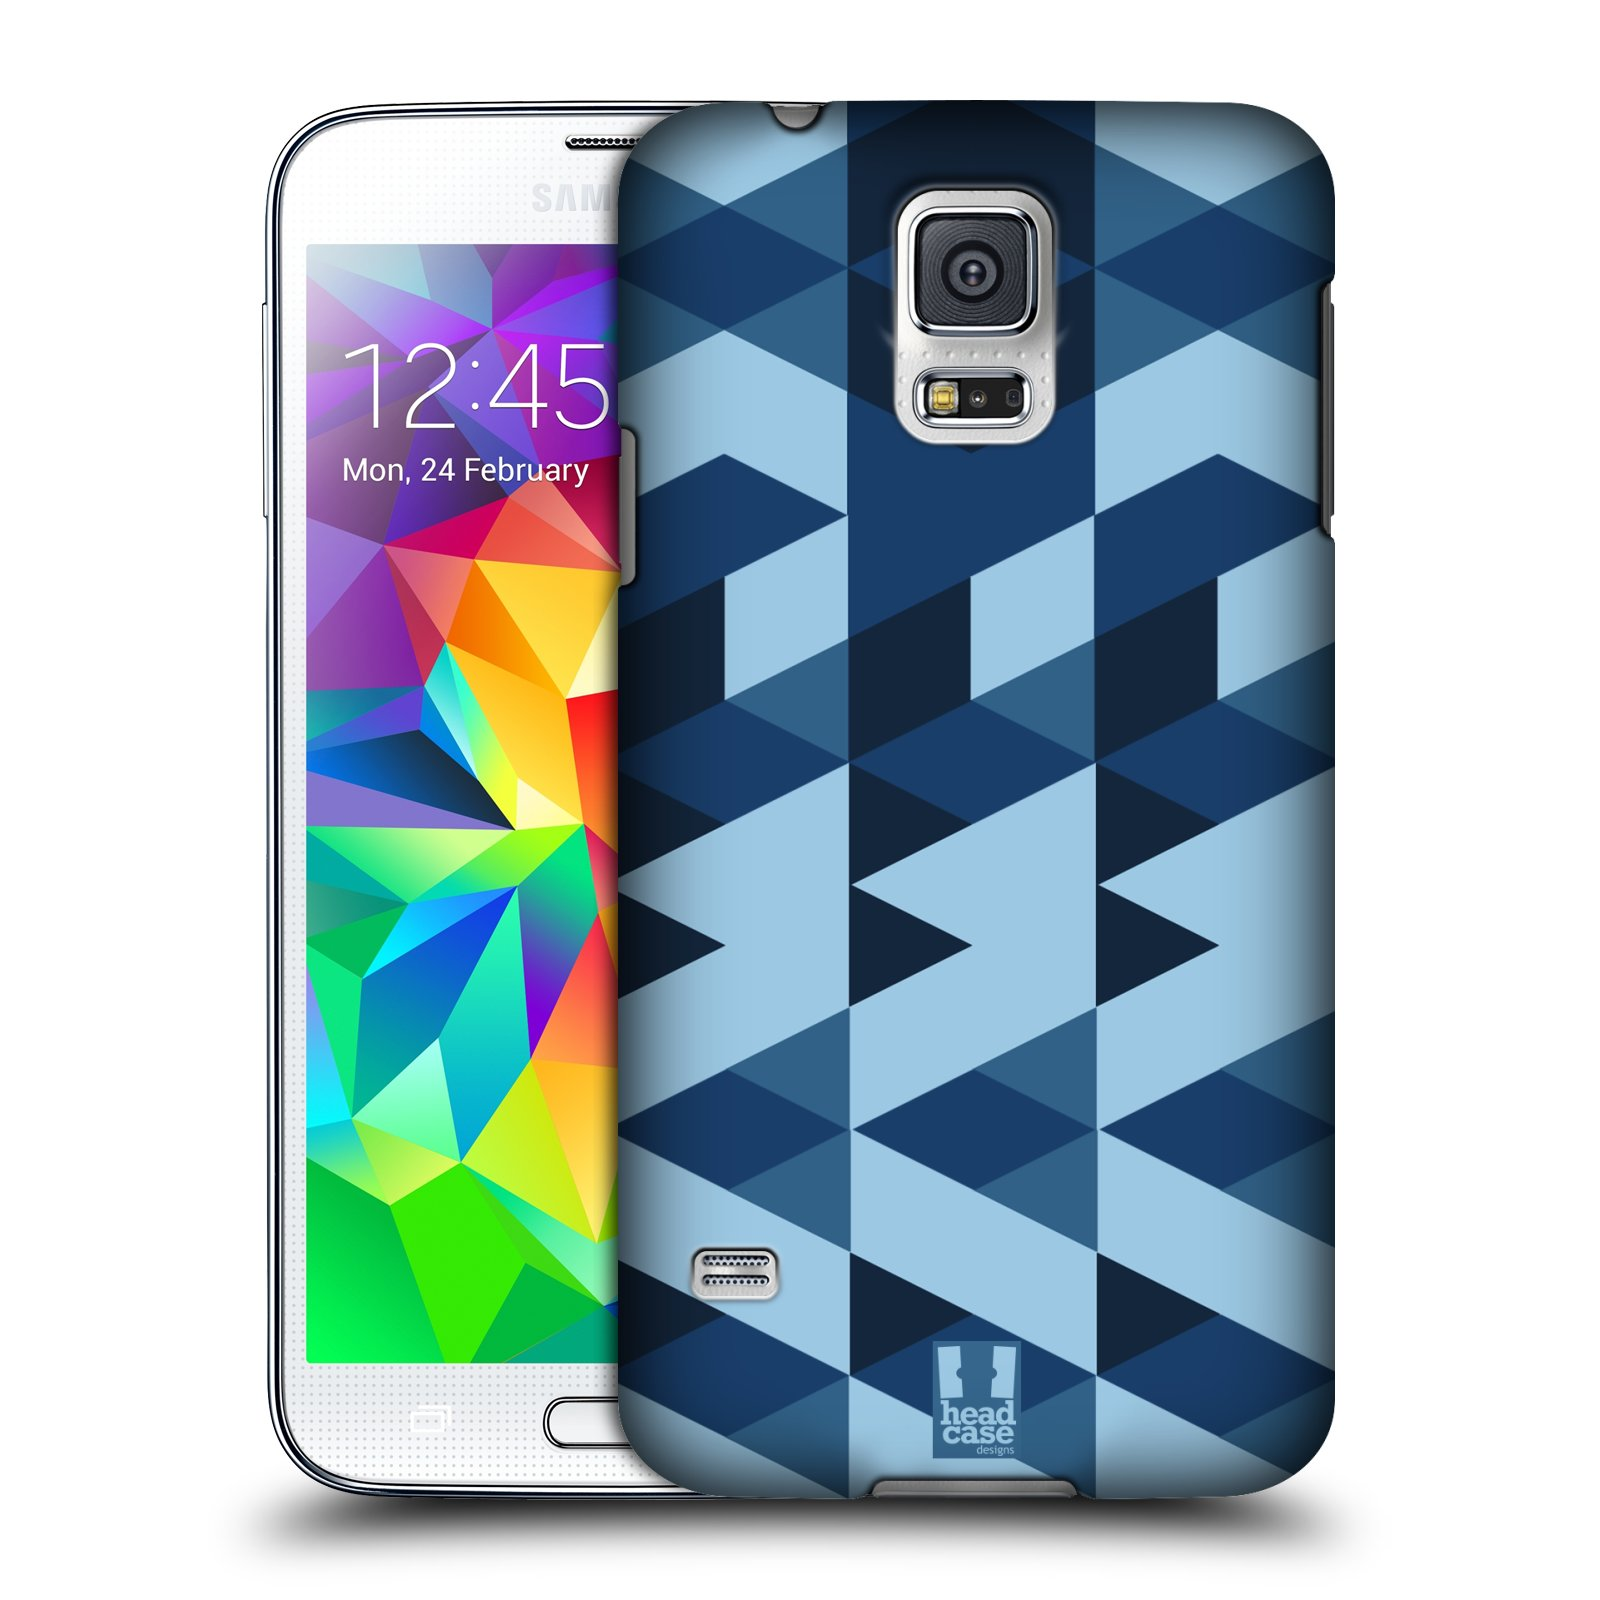 Plastové pouzdro na mobil Samsung Galaxy S5 HEAD CASE GEOMETRIC BLUE (Kryt či obal na mobilní telefon Samsung Galaxy S5 SM-G900F)